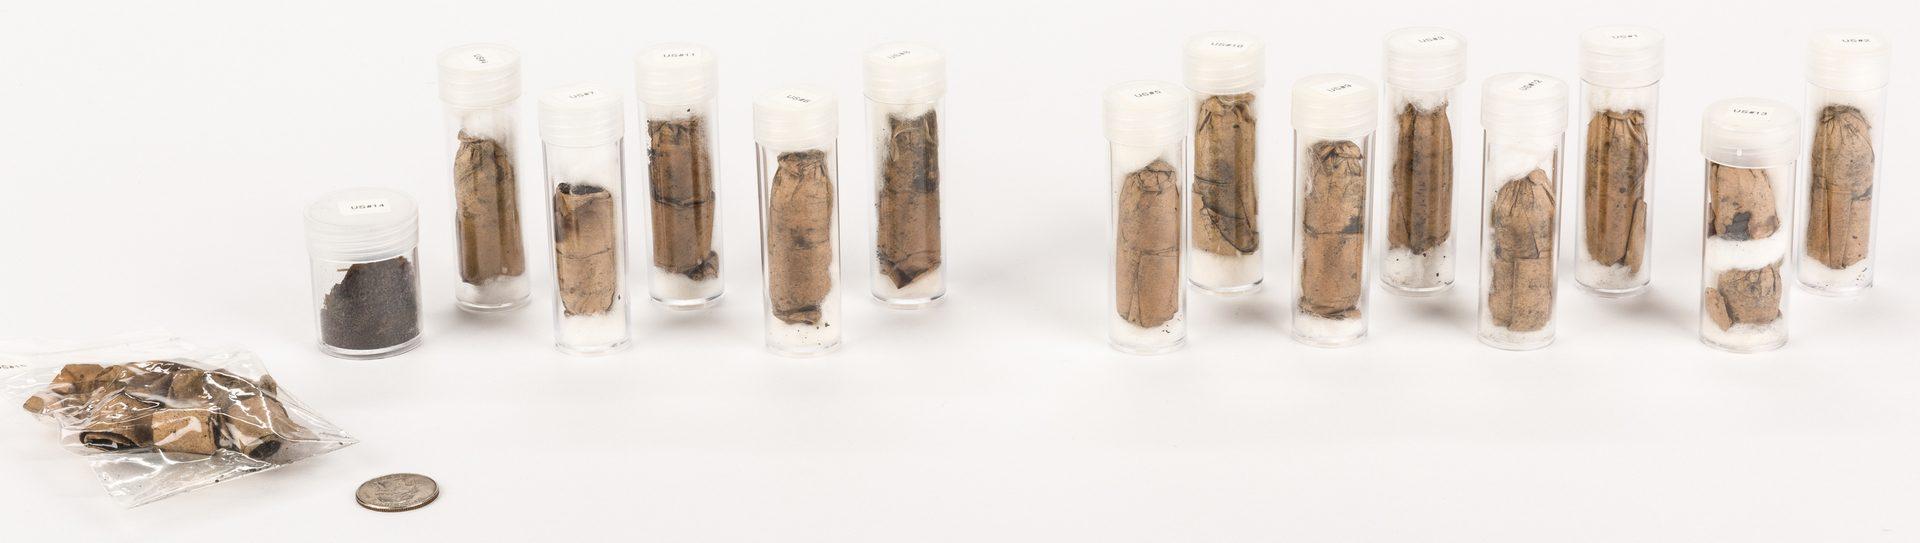 Lot 224: Collection Civil War Paper Musket Cartridges